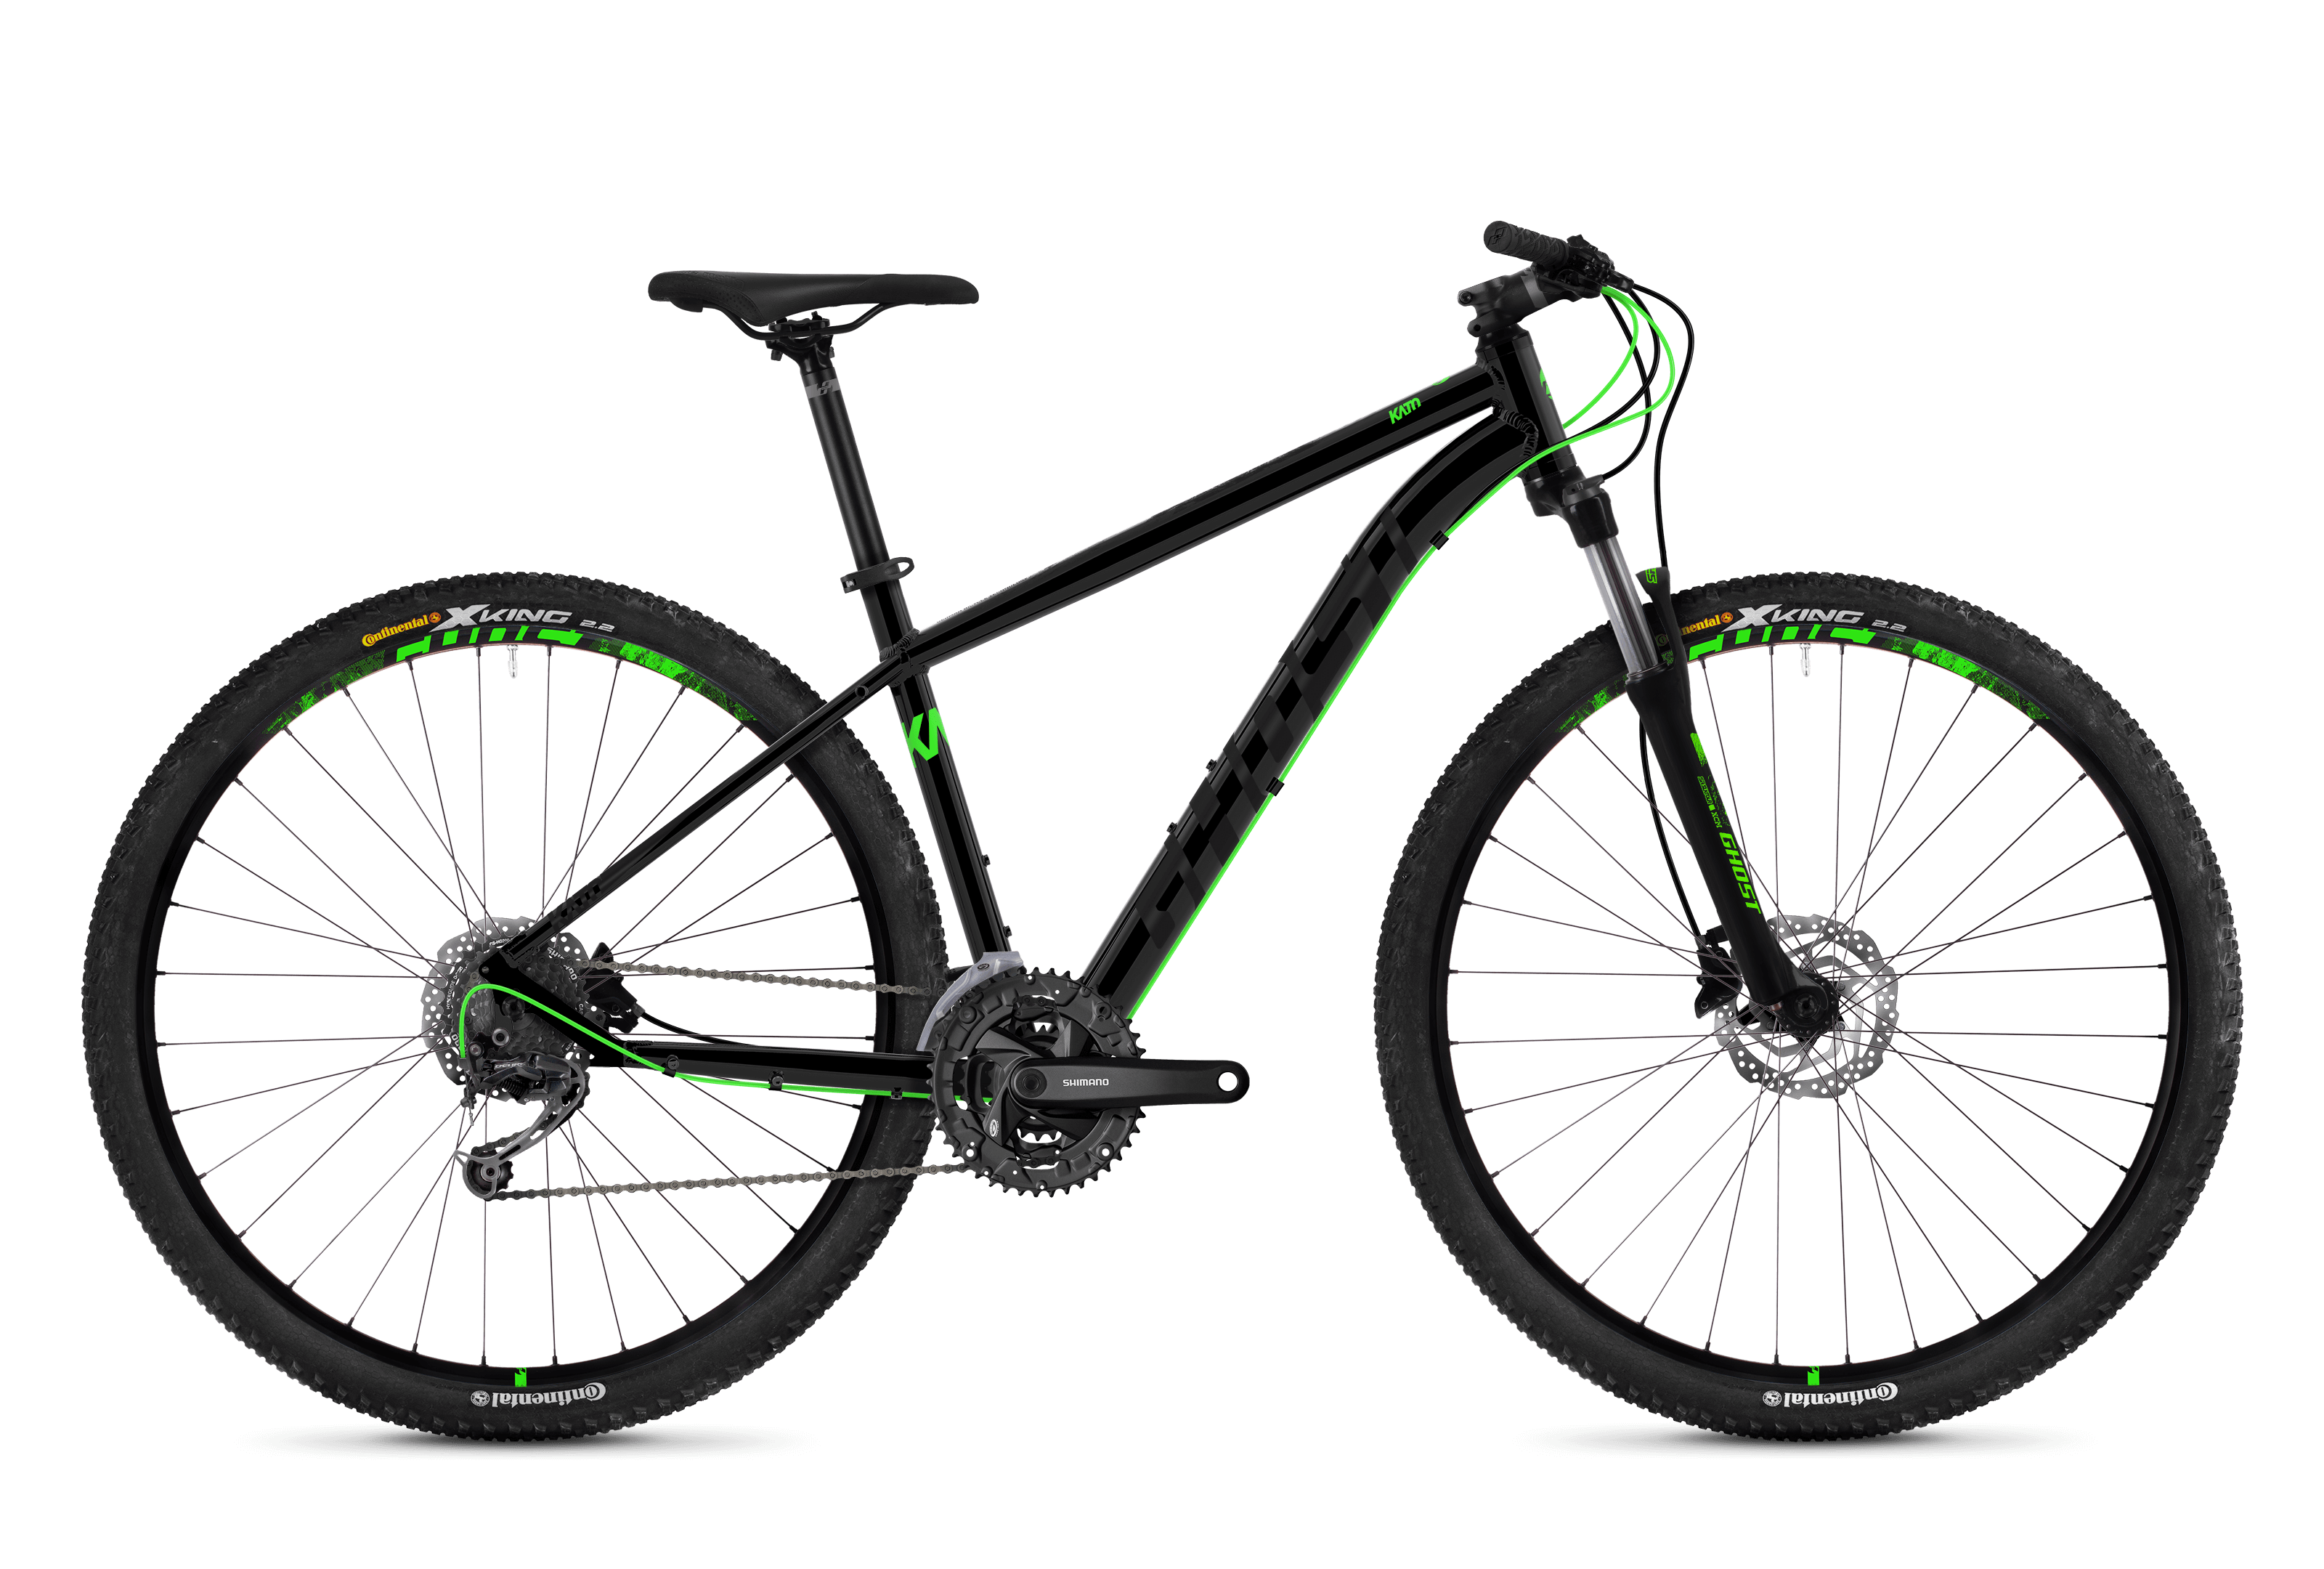 Horské kolo GHOST Kato 4.9 black / green S 2018